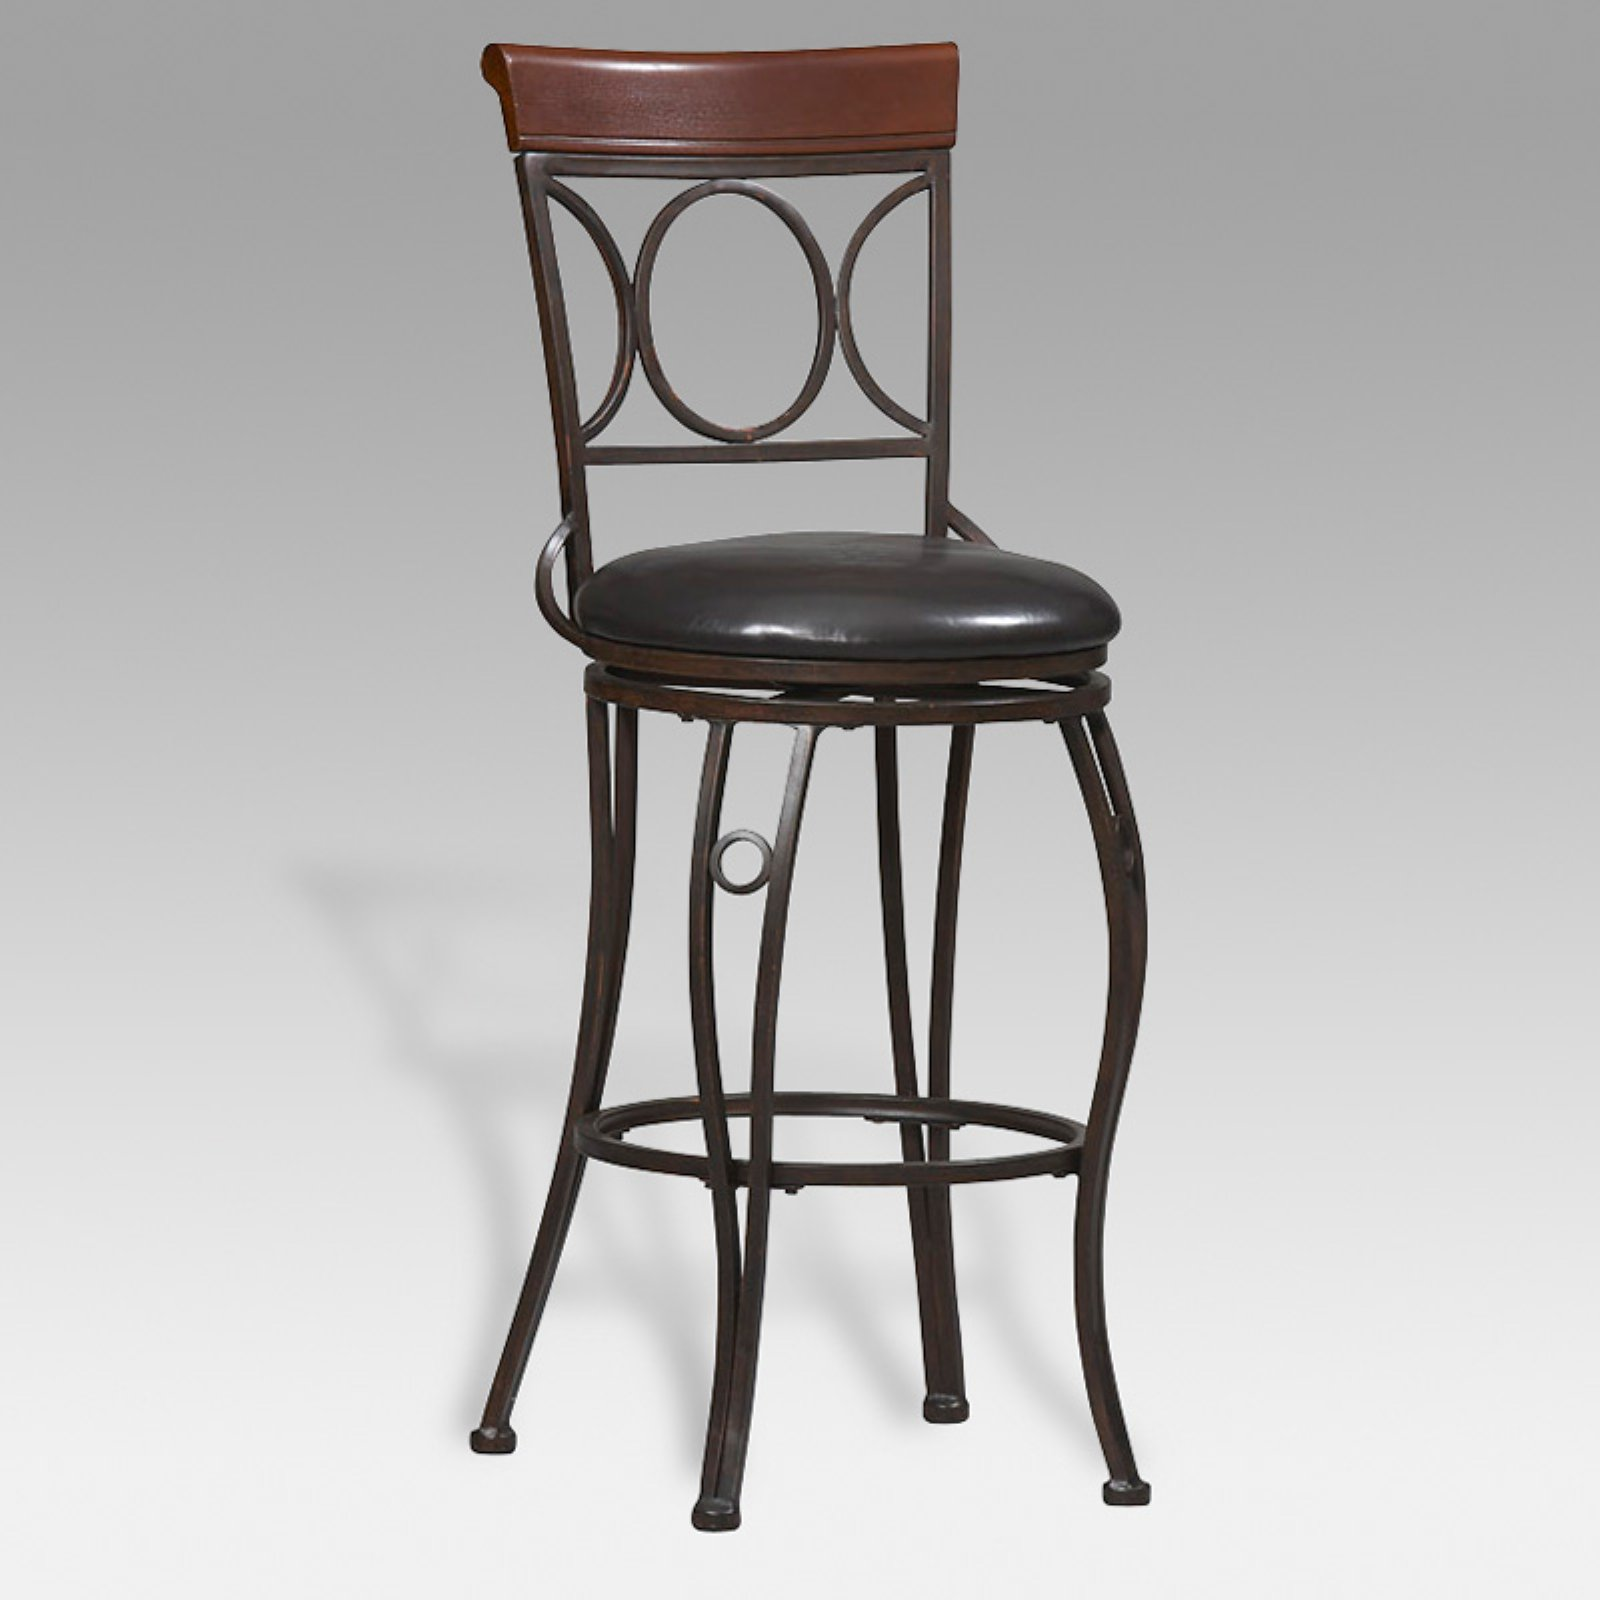 Linon 30 Inch Bingham Circles Back Swivel Bar Stool In 2021 Swivel Counter Stools Bar Stools With Backs Counter Stools 30 inch swivel bar stools with back